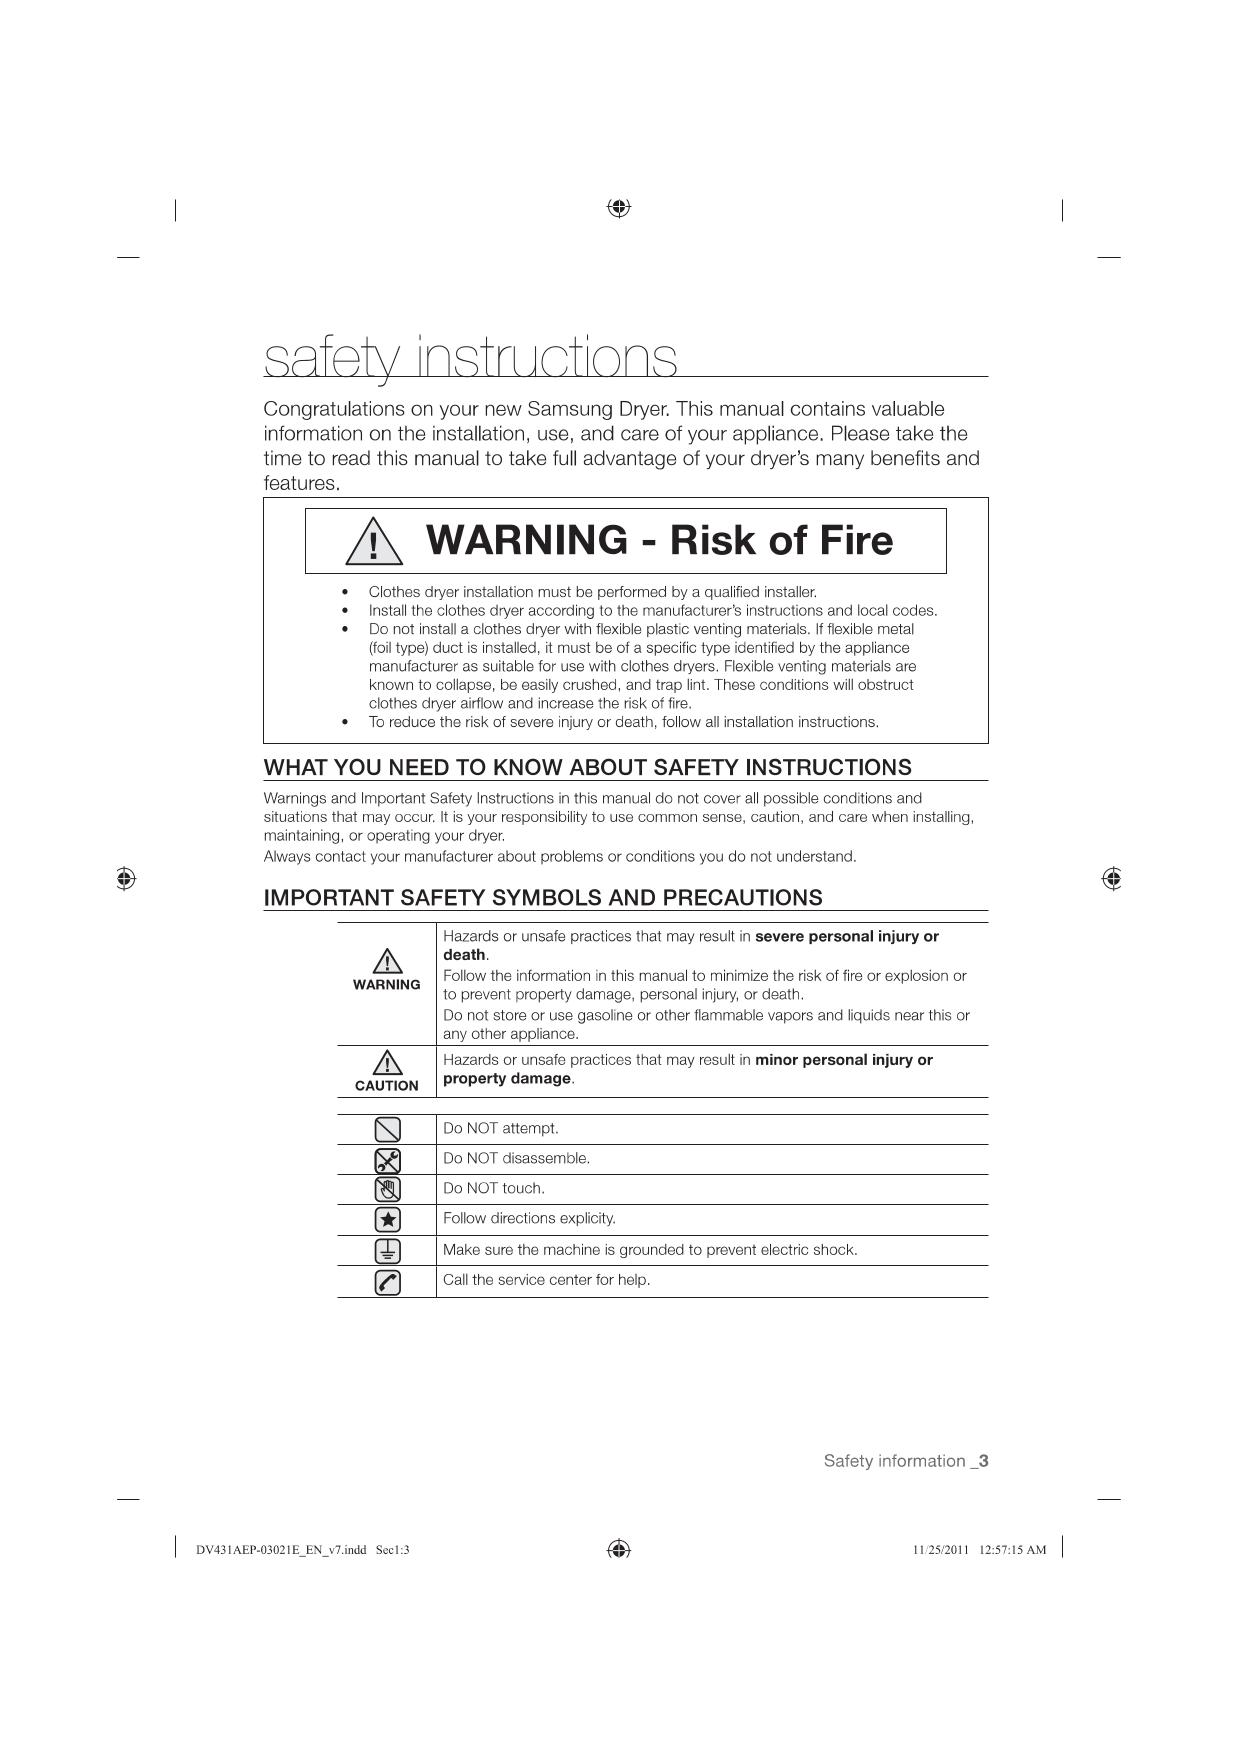 PDF manual for Samsung Dryer DV431AEP